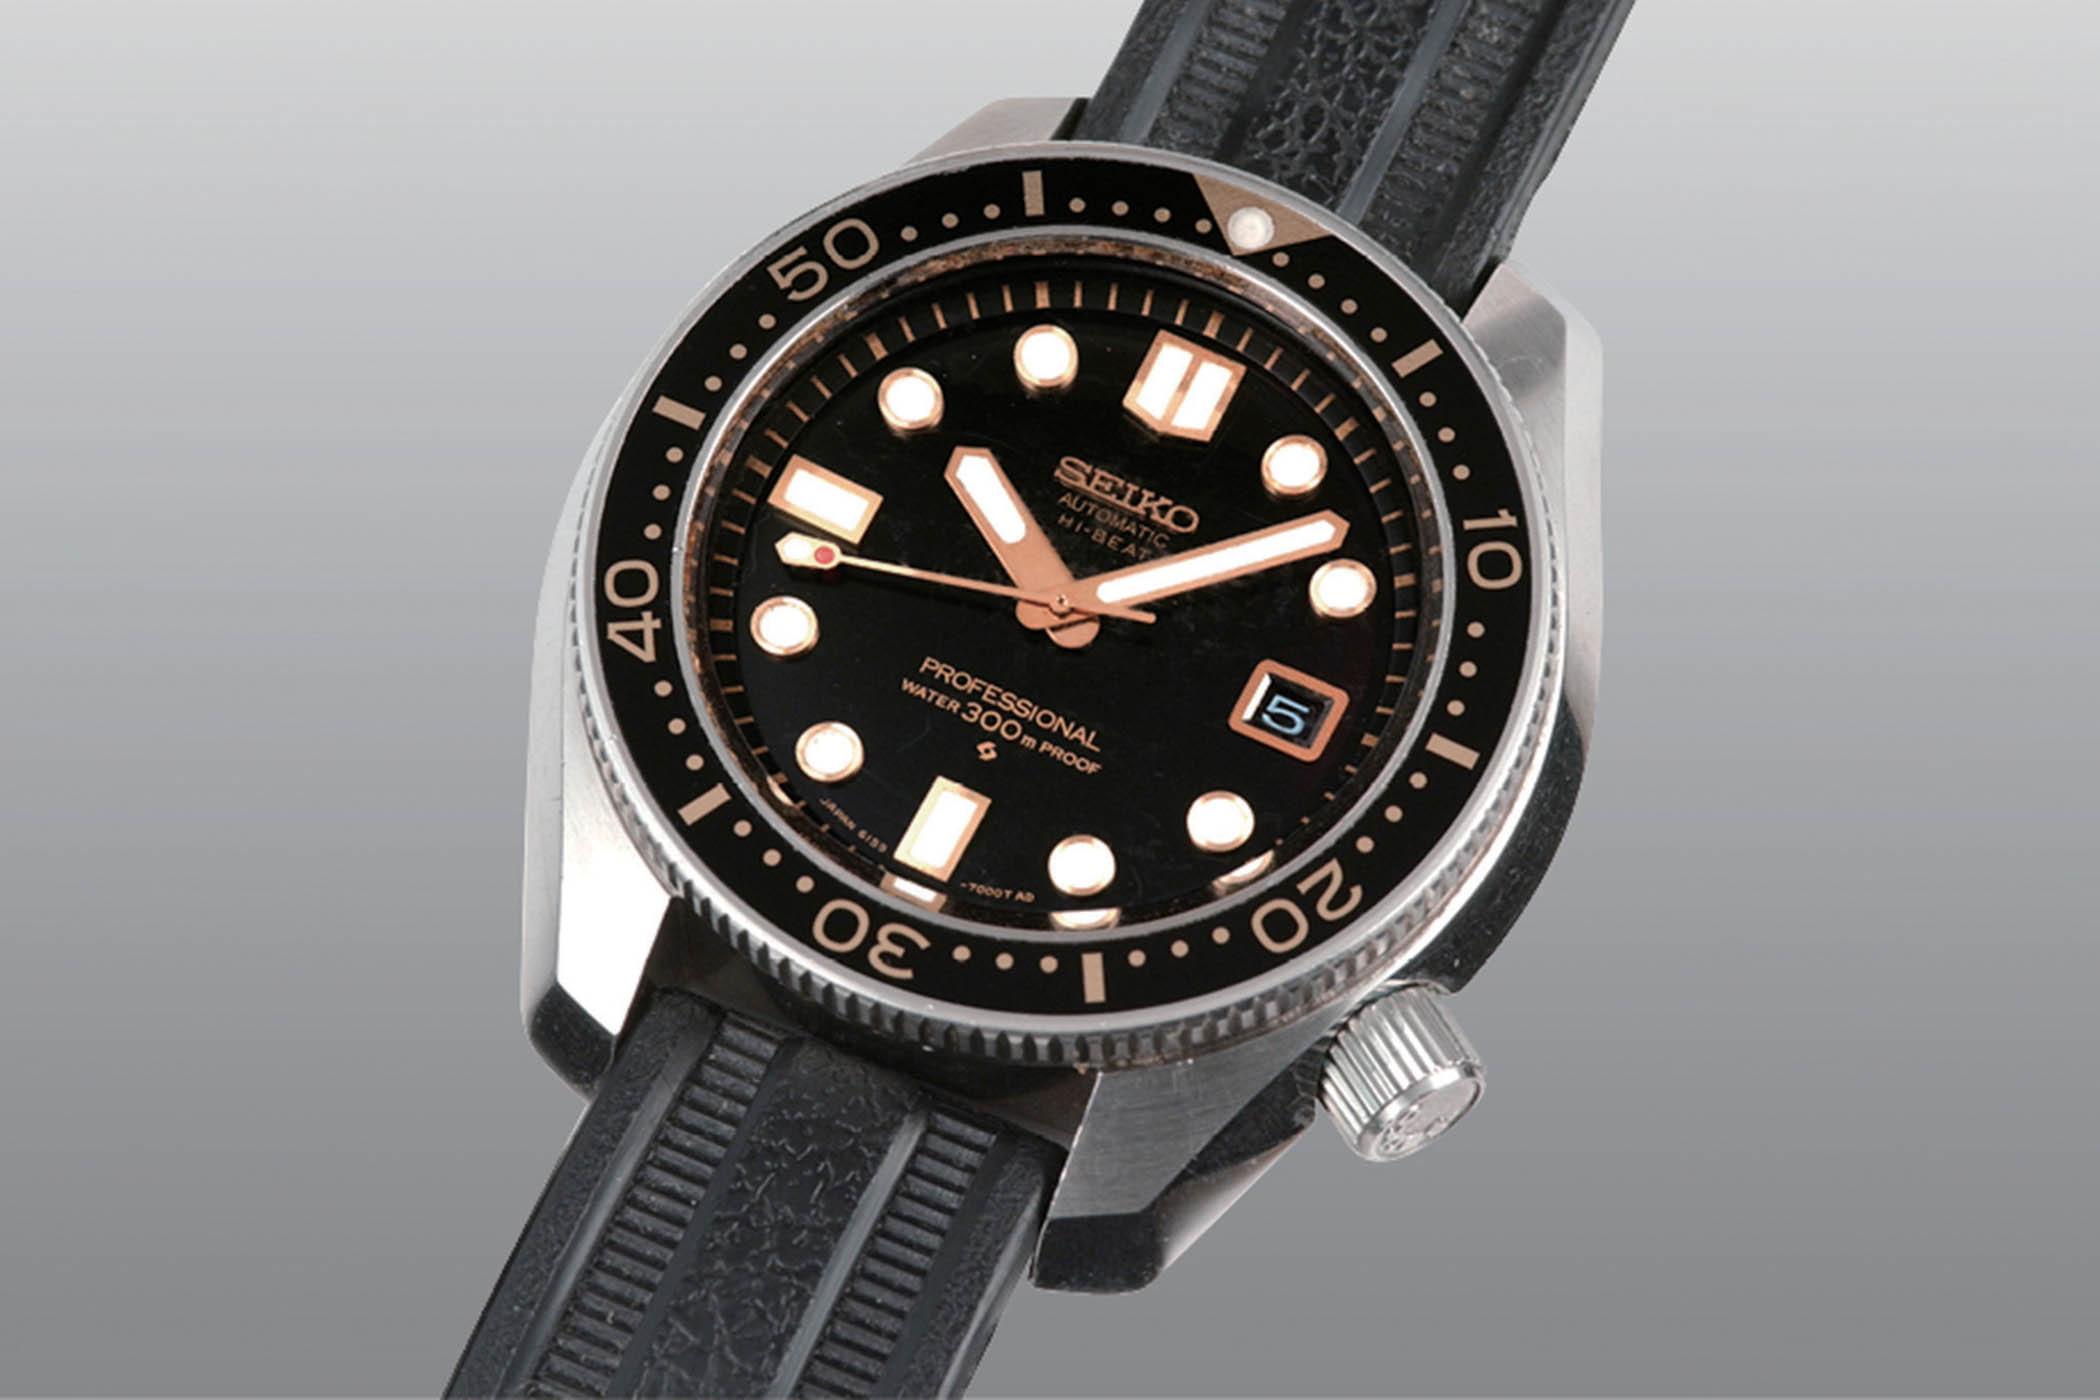 1968 Seiko Diver 300m hi-beat 6159-7001